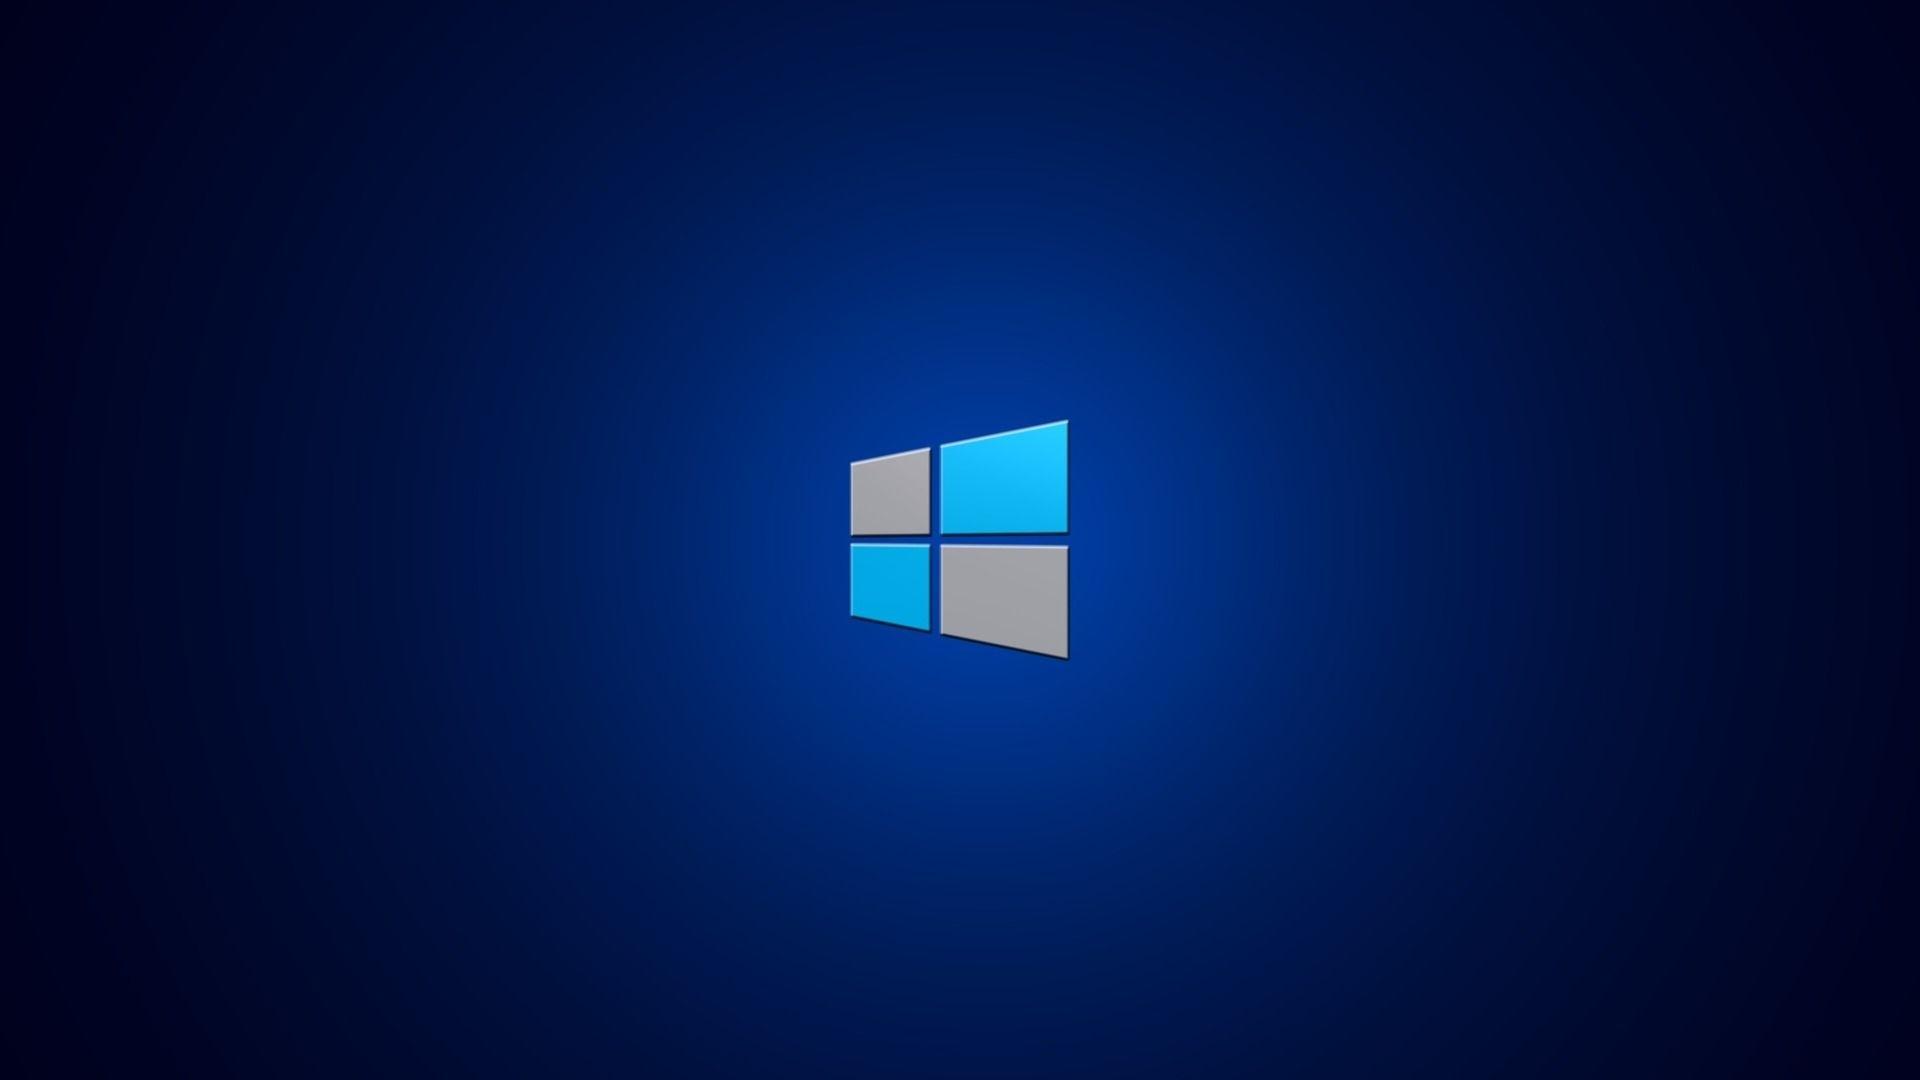 windows 8 minimal official logo 1080p hd wallpaper 1080p hd | stuff